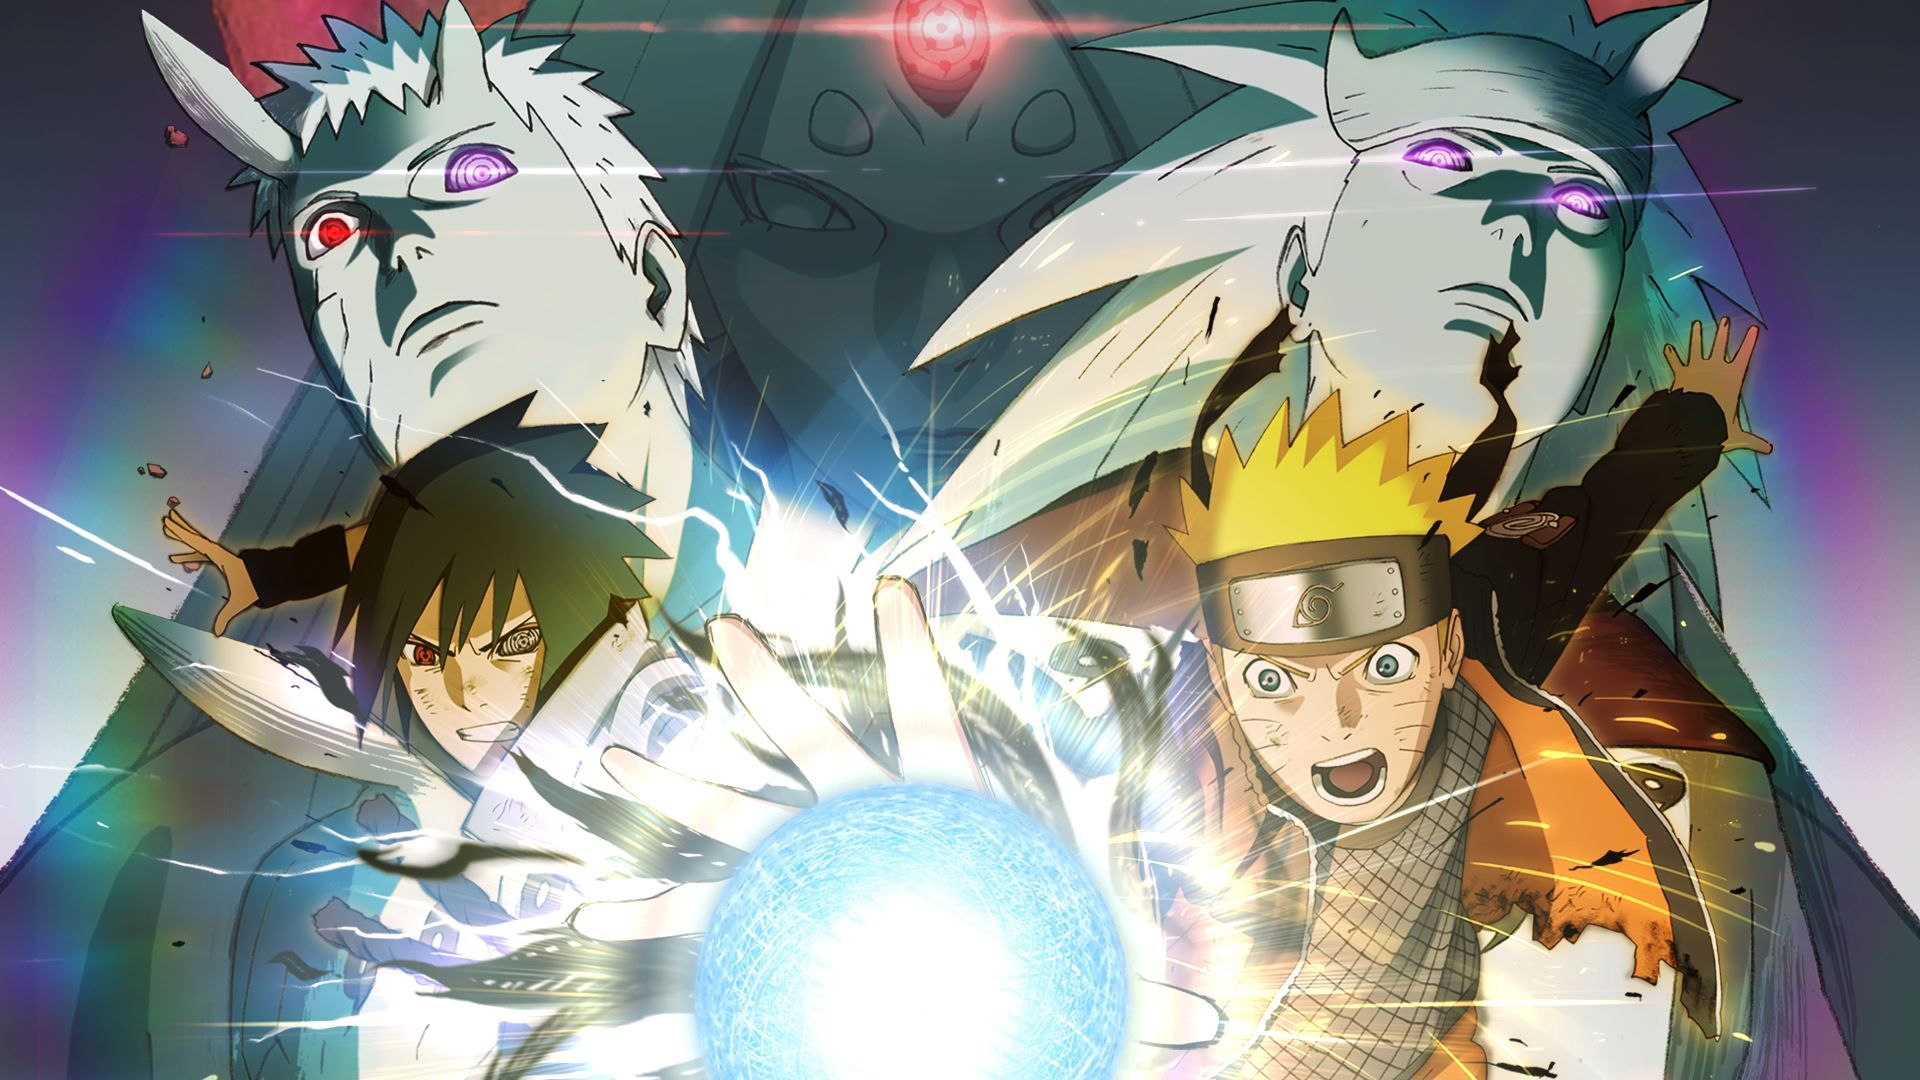 Naruto Storm 4 Art Naruto Fond D Ecran Telephone Manga Fond D Ecran Telephone